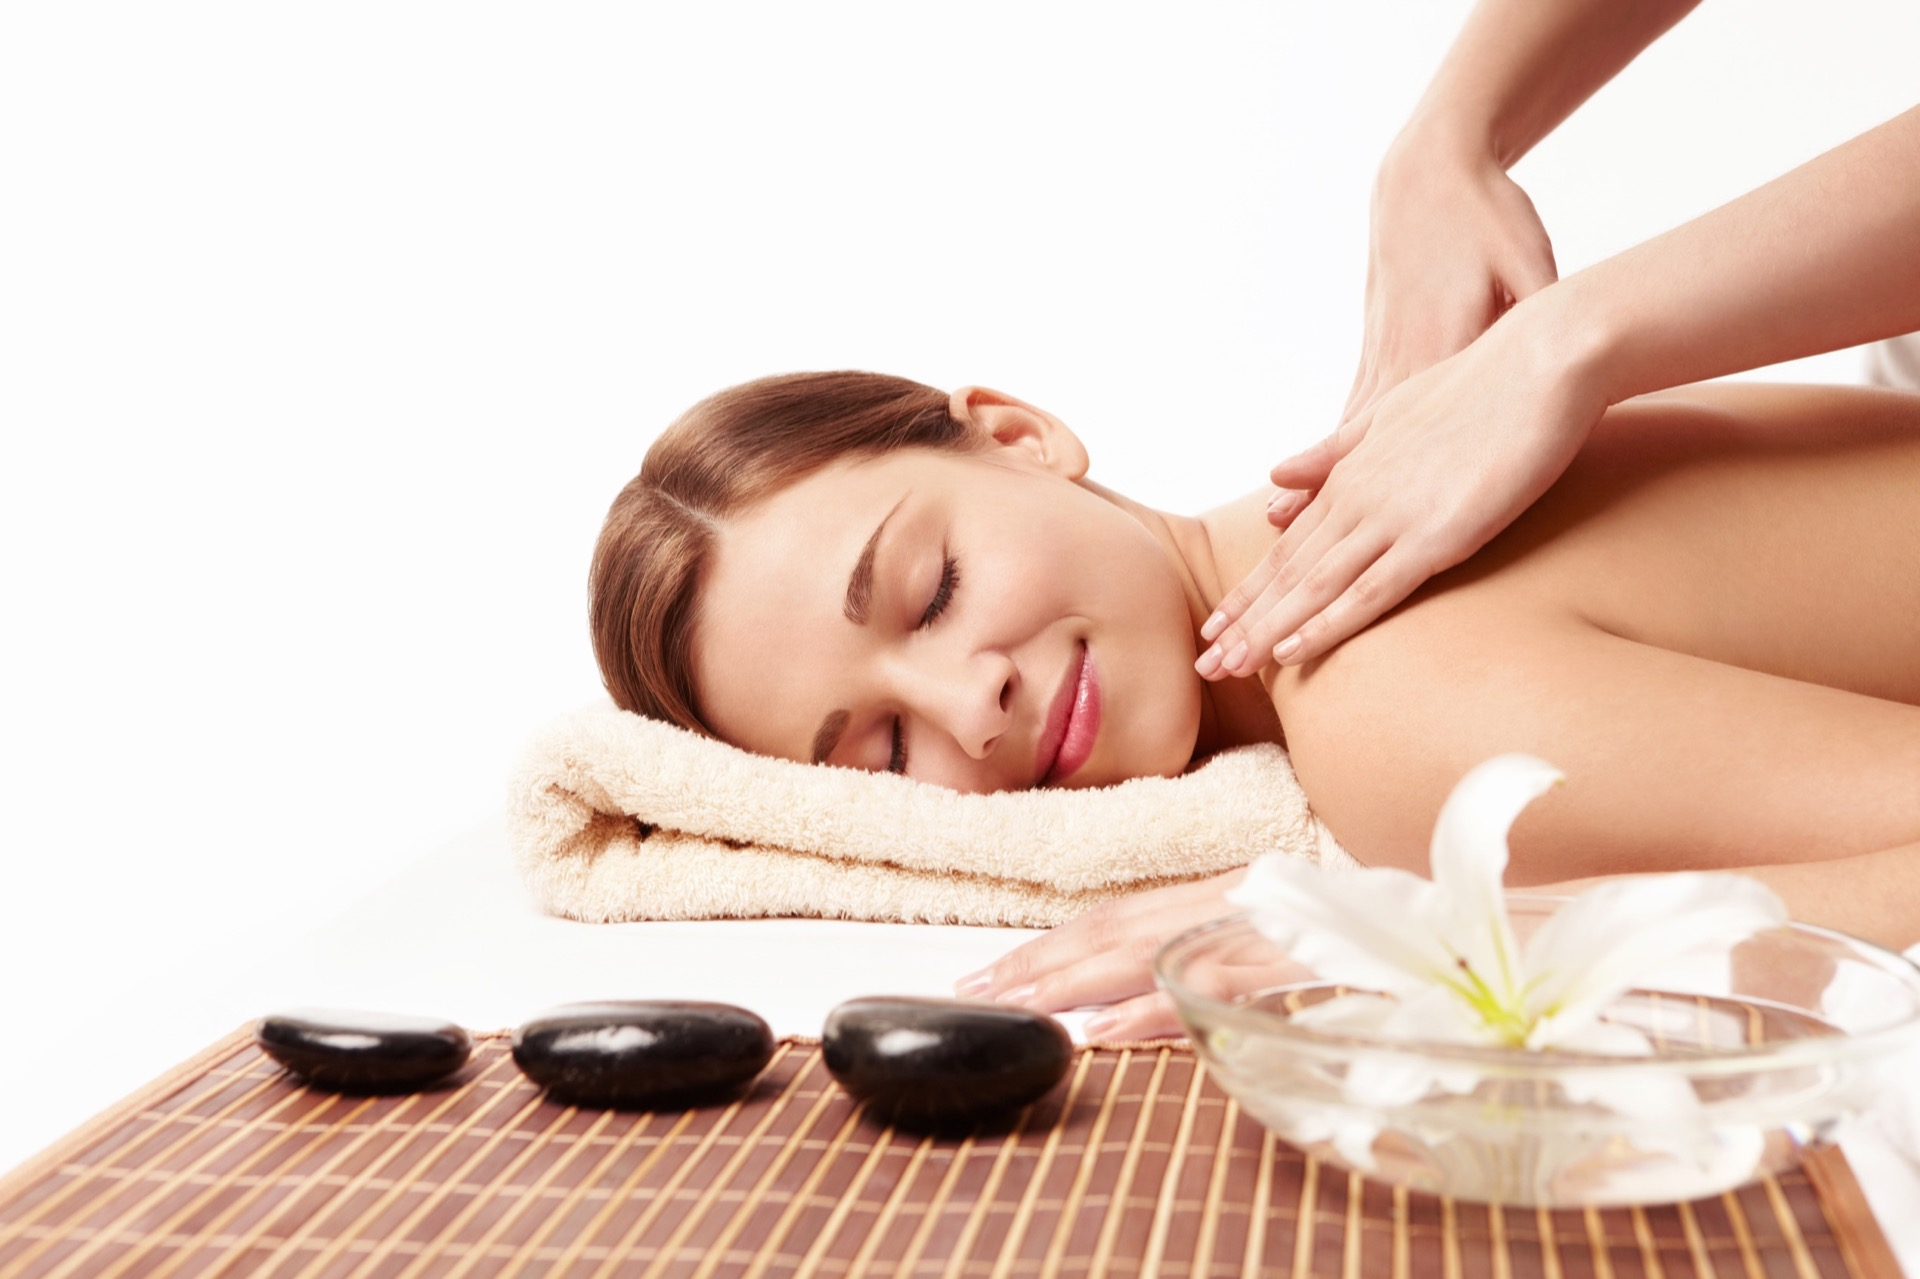 Hautnah-Beautylounge Kosmetikbehandlung Hamburg Norderstedt Massage S